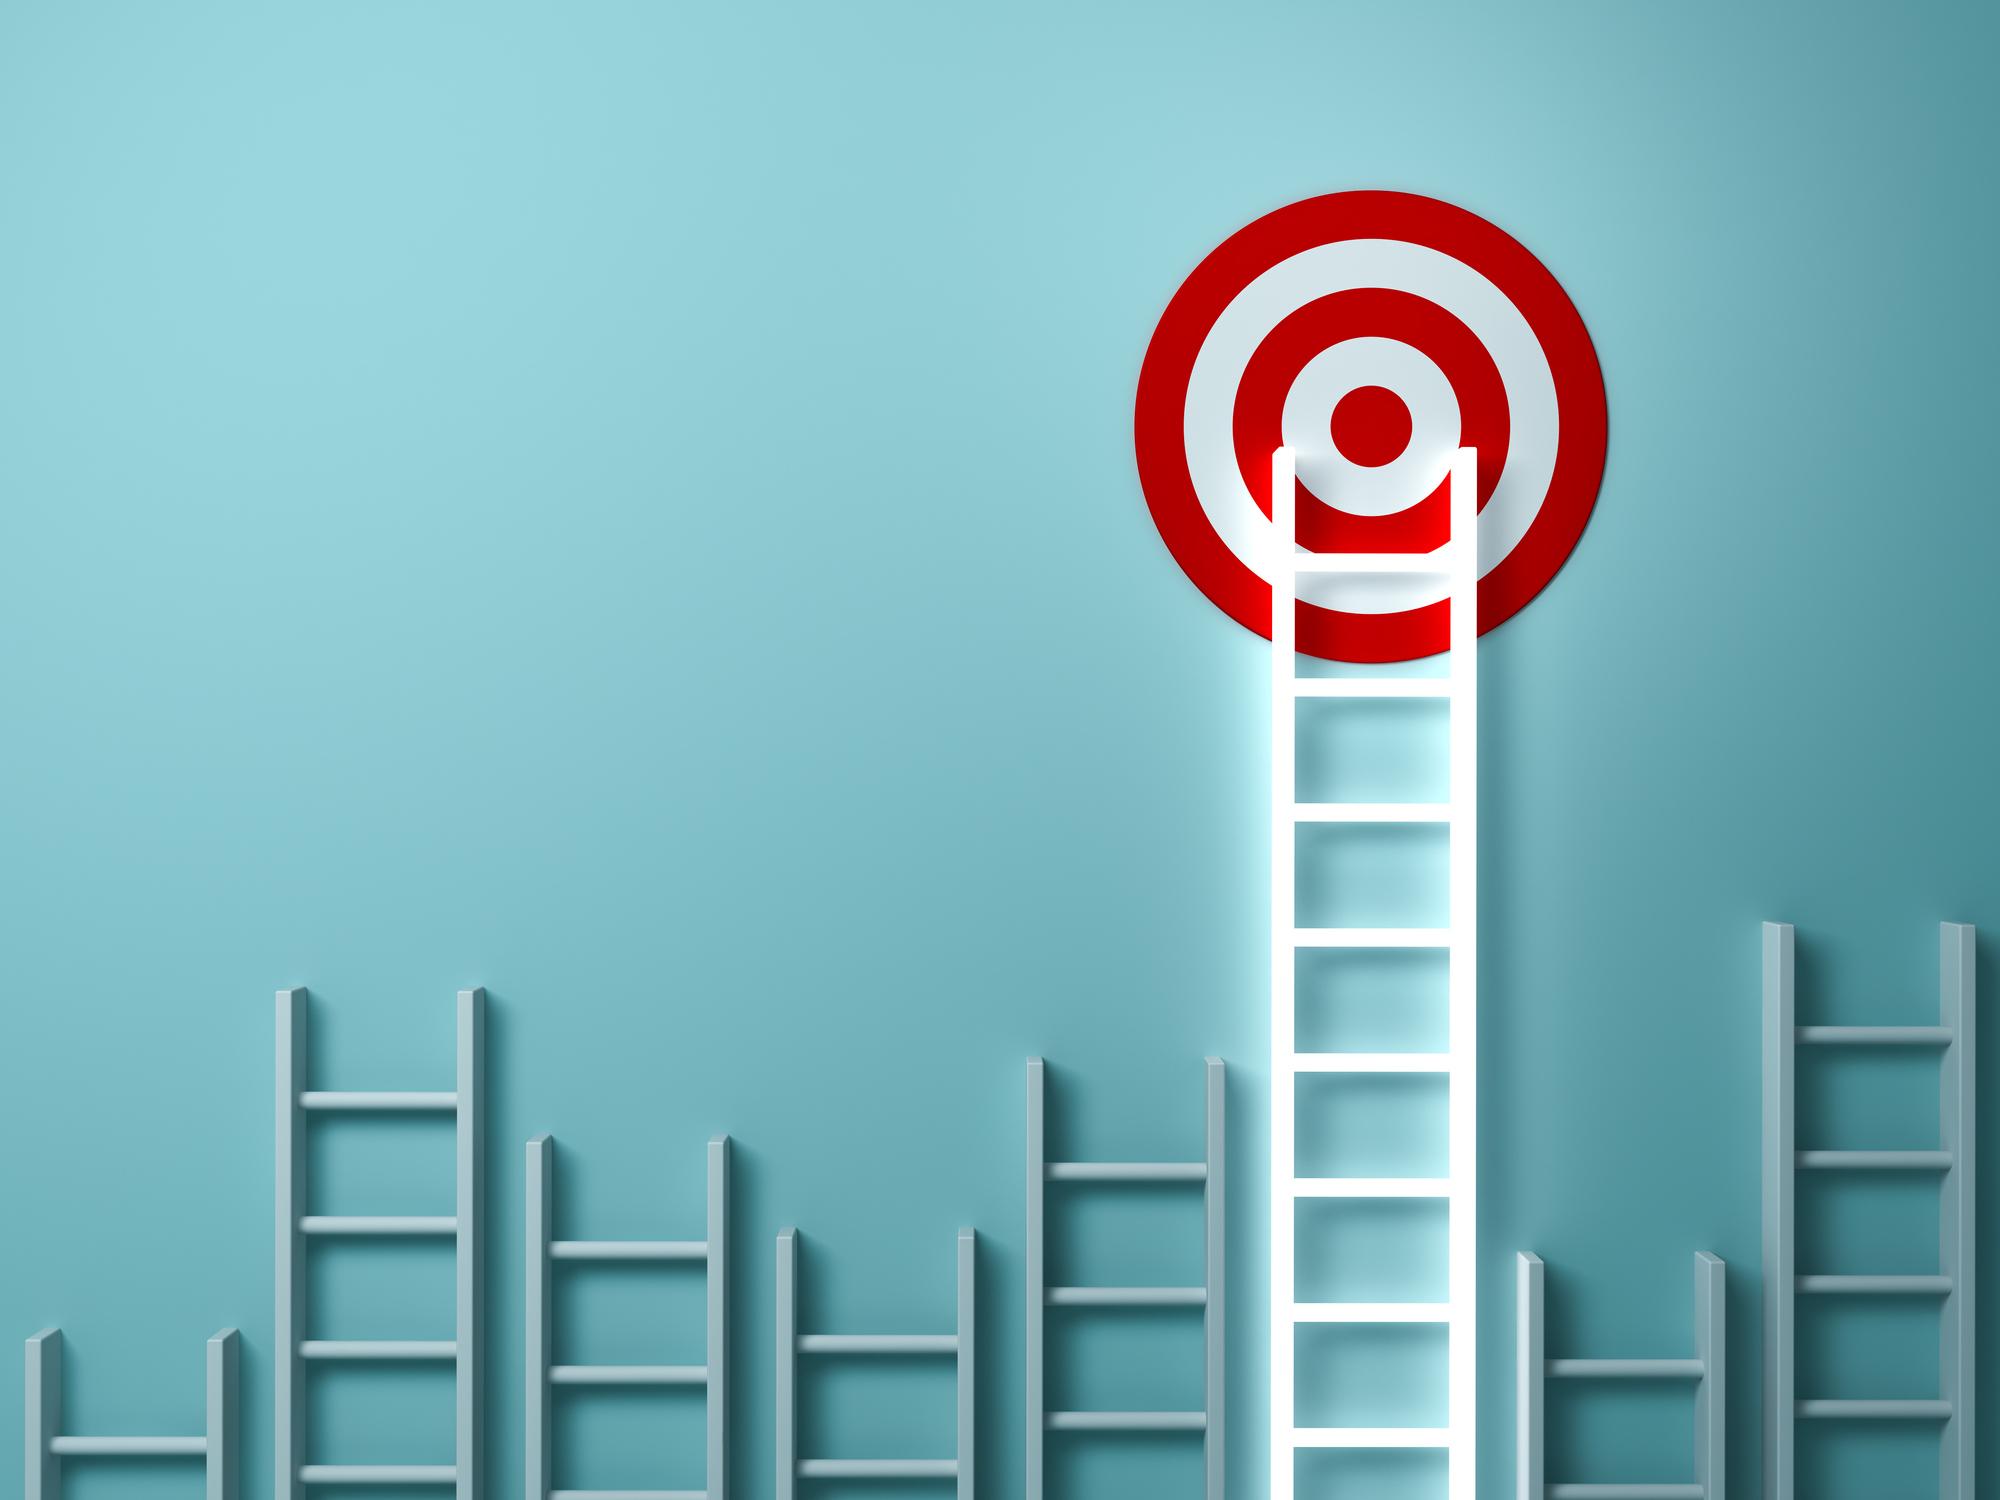 calificacion-esfuerzo-cliente-ces-escalera-objetivo